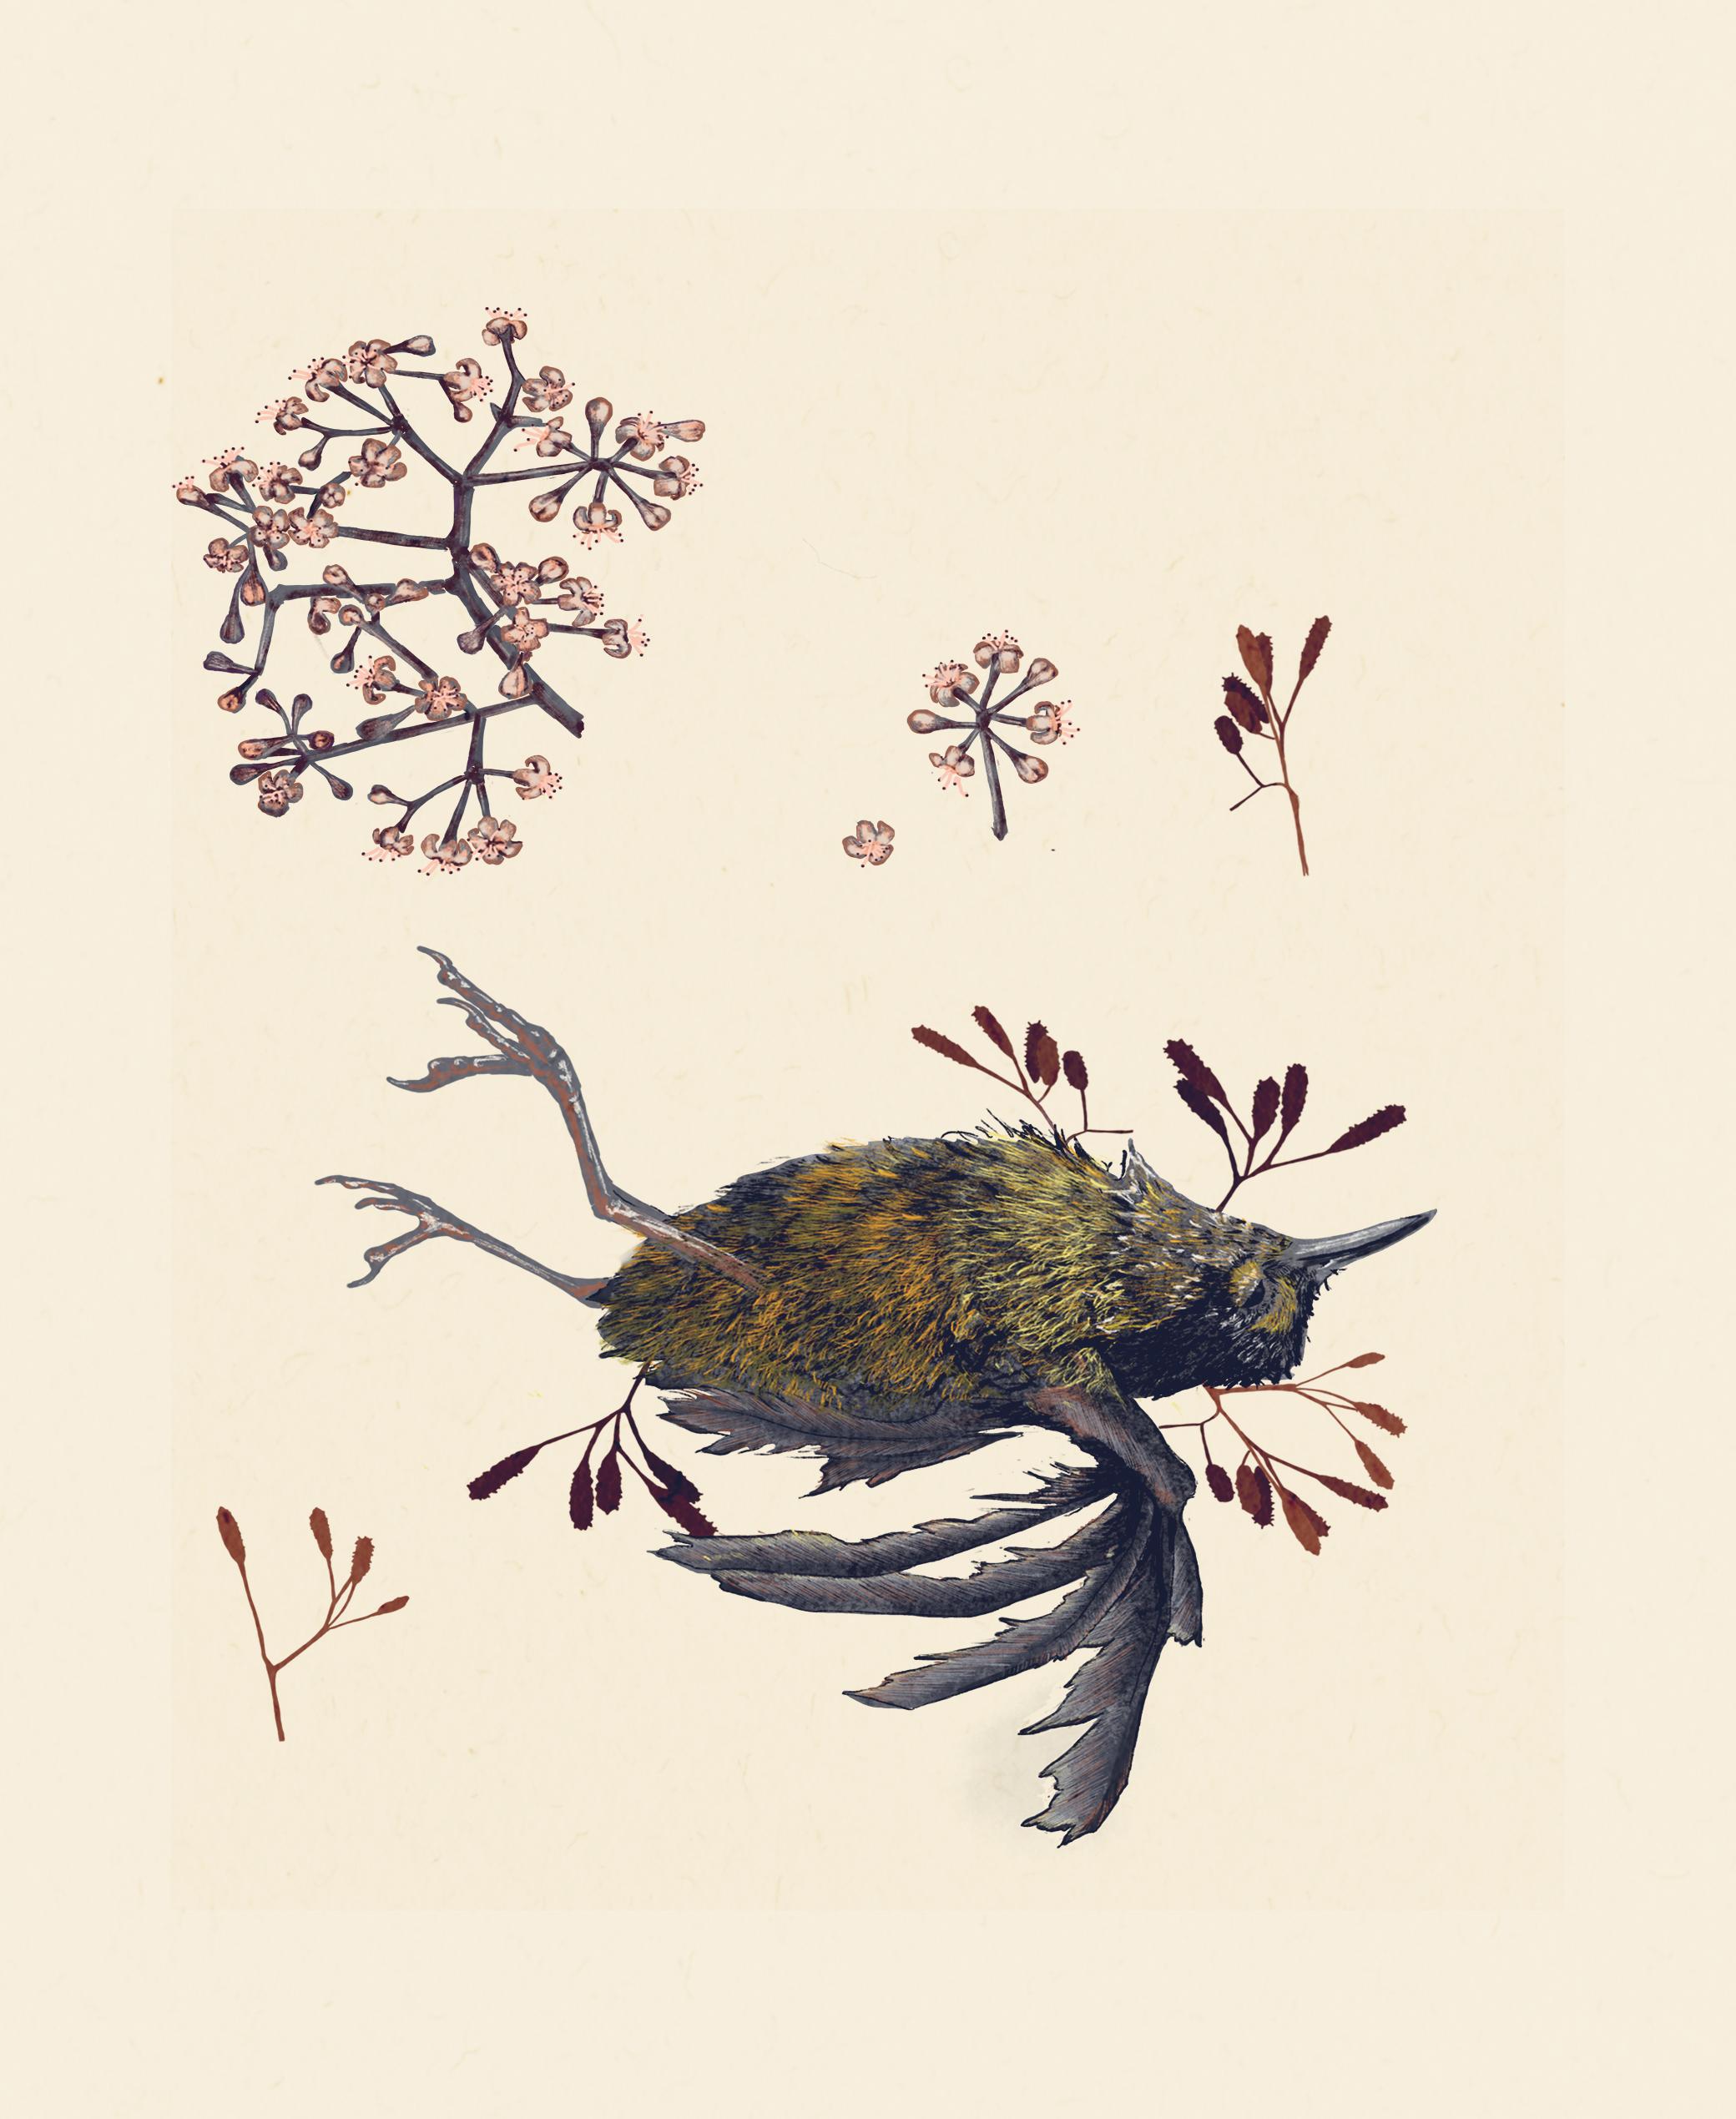 Bird_catcher.jpg